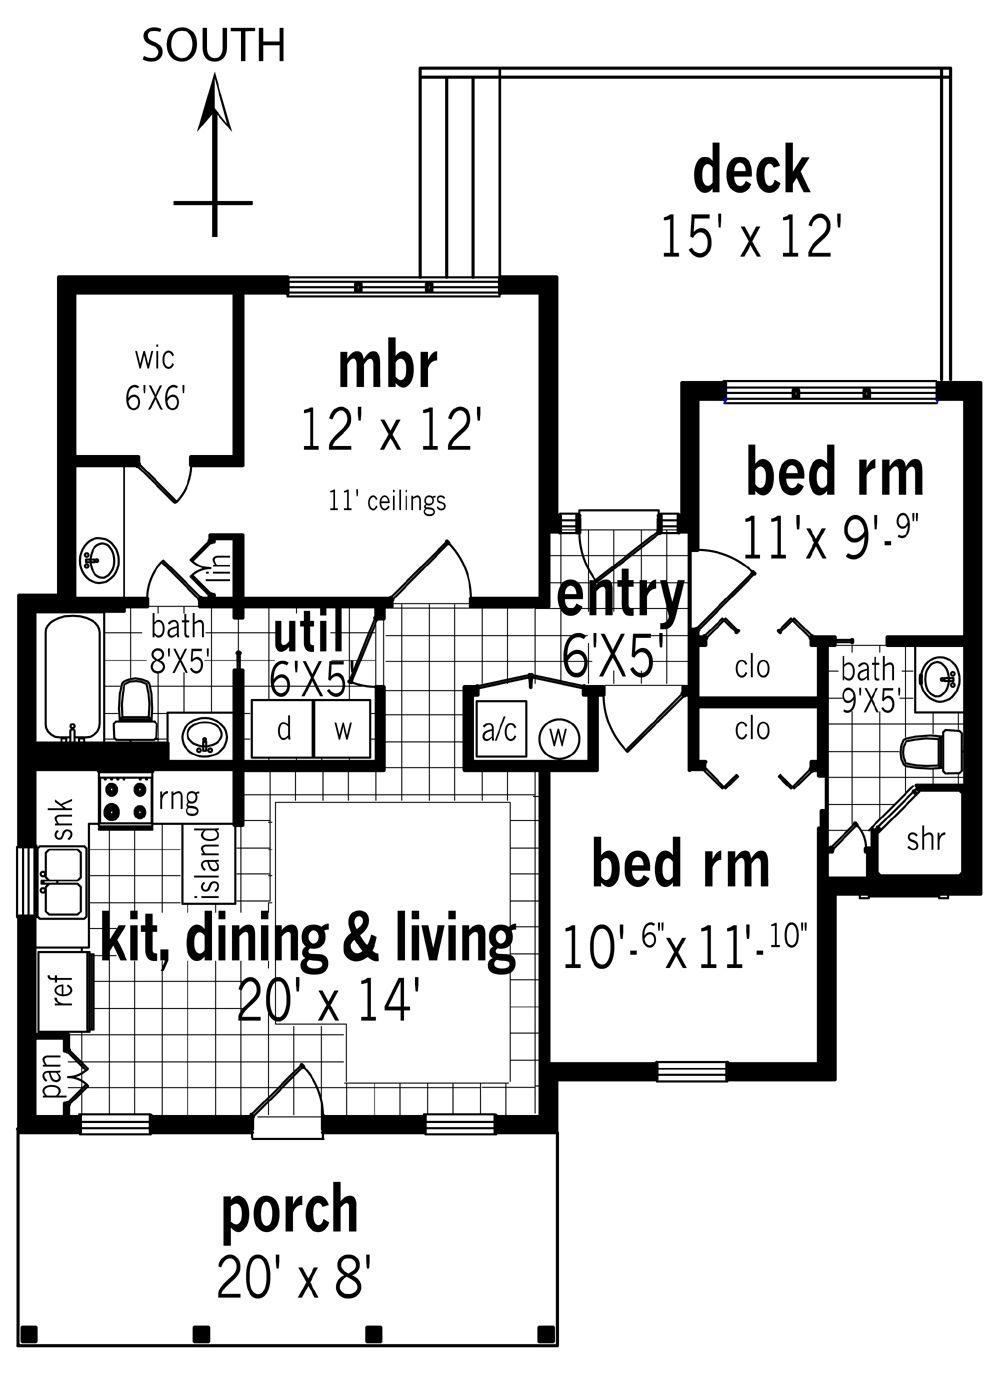 Wondrous 17 Best Images About House Plans On Pinterest Craftsman Square Largest Home Design Picture Inspirations Pitcheantrous